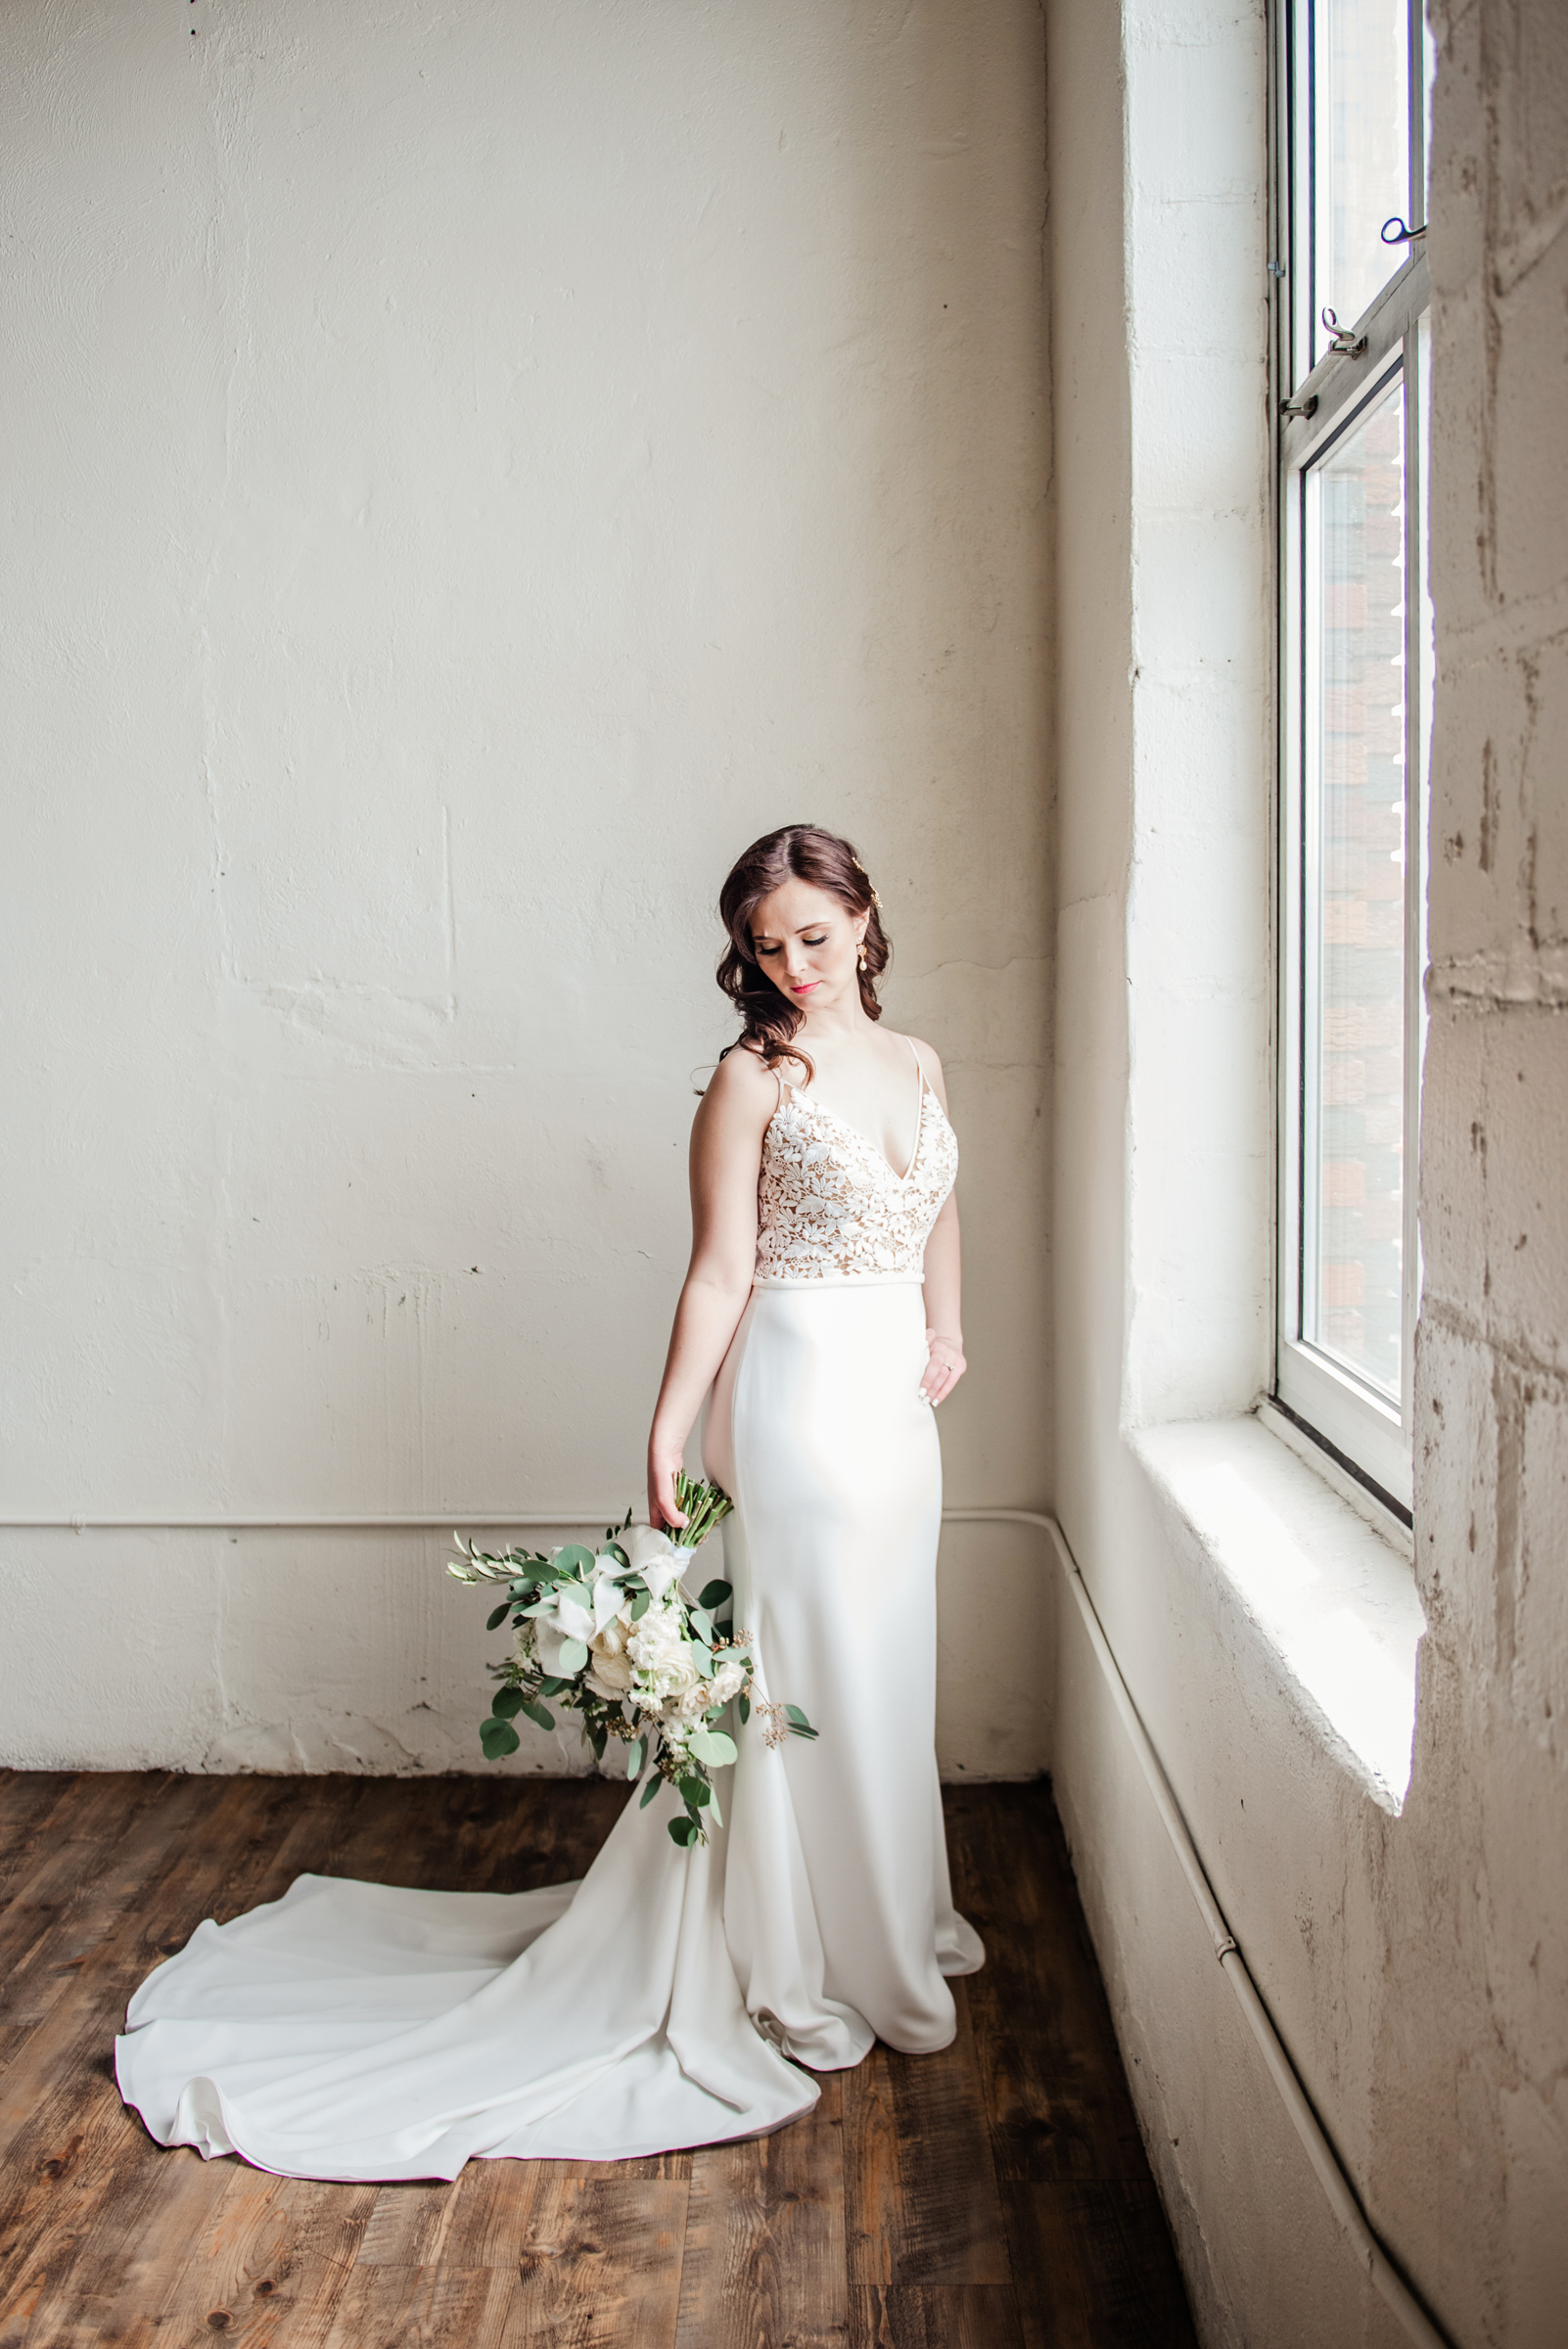 The_Arbor_LoftRochester_Wedding_JILL_STUDIO_Rochester_NY_Photographer_161457.jpg